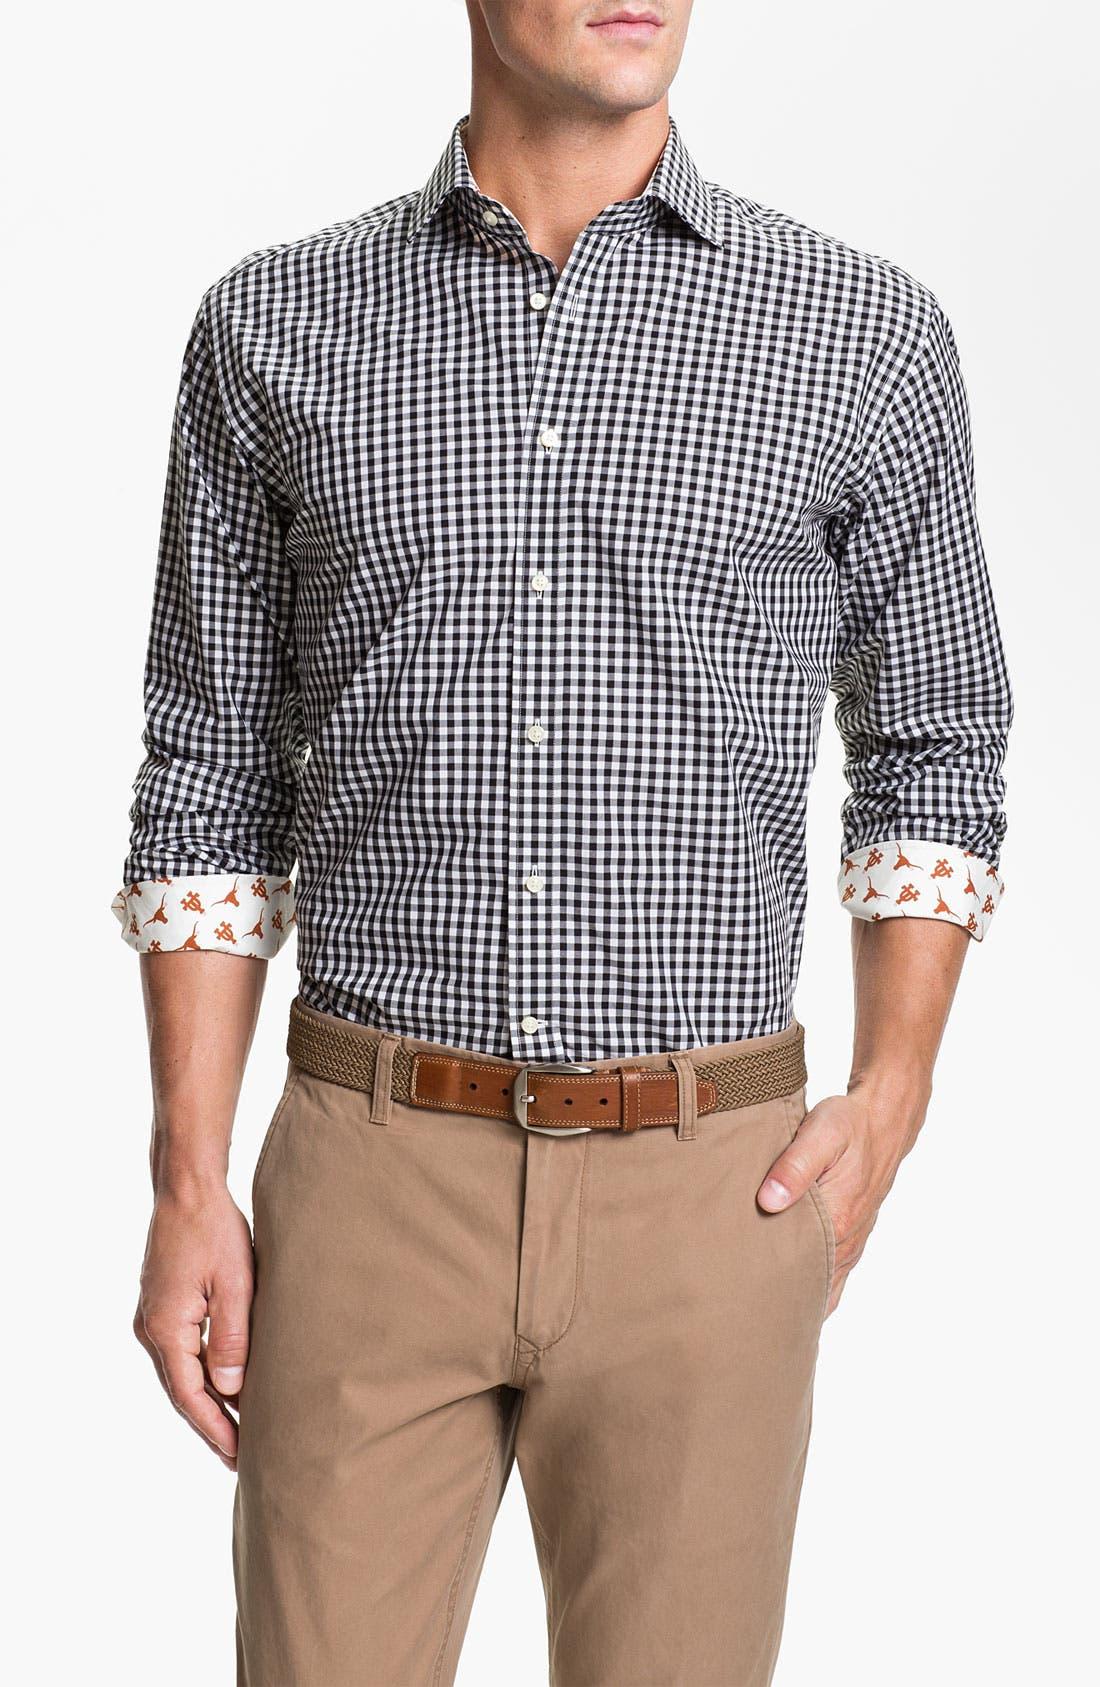 Alternate Image 1 Selected - Thomas Dean 'University of Texas' Gingham Sport Shirt (Online Only)